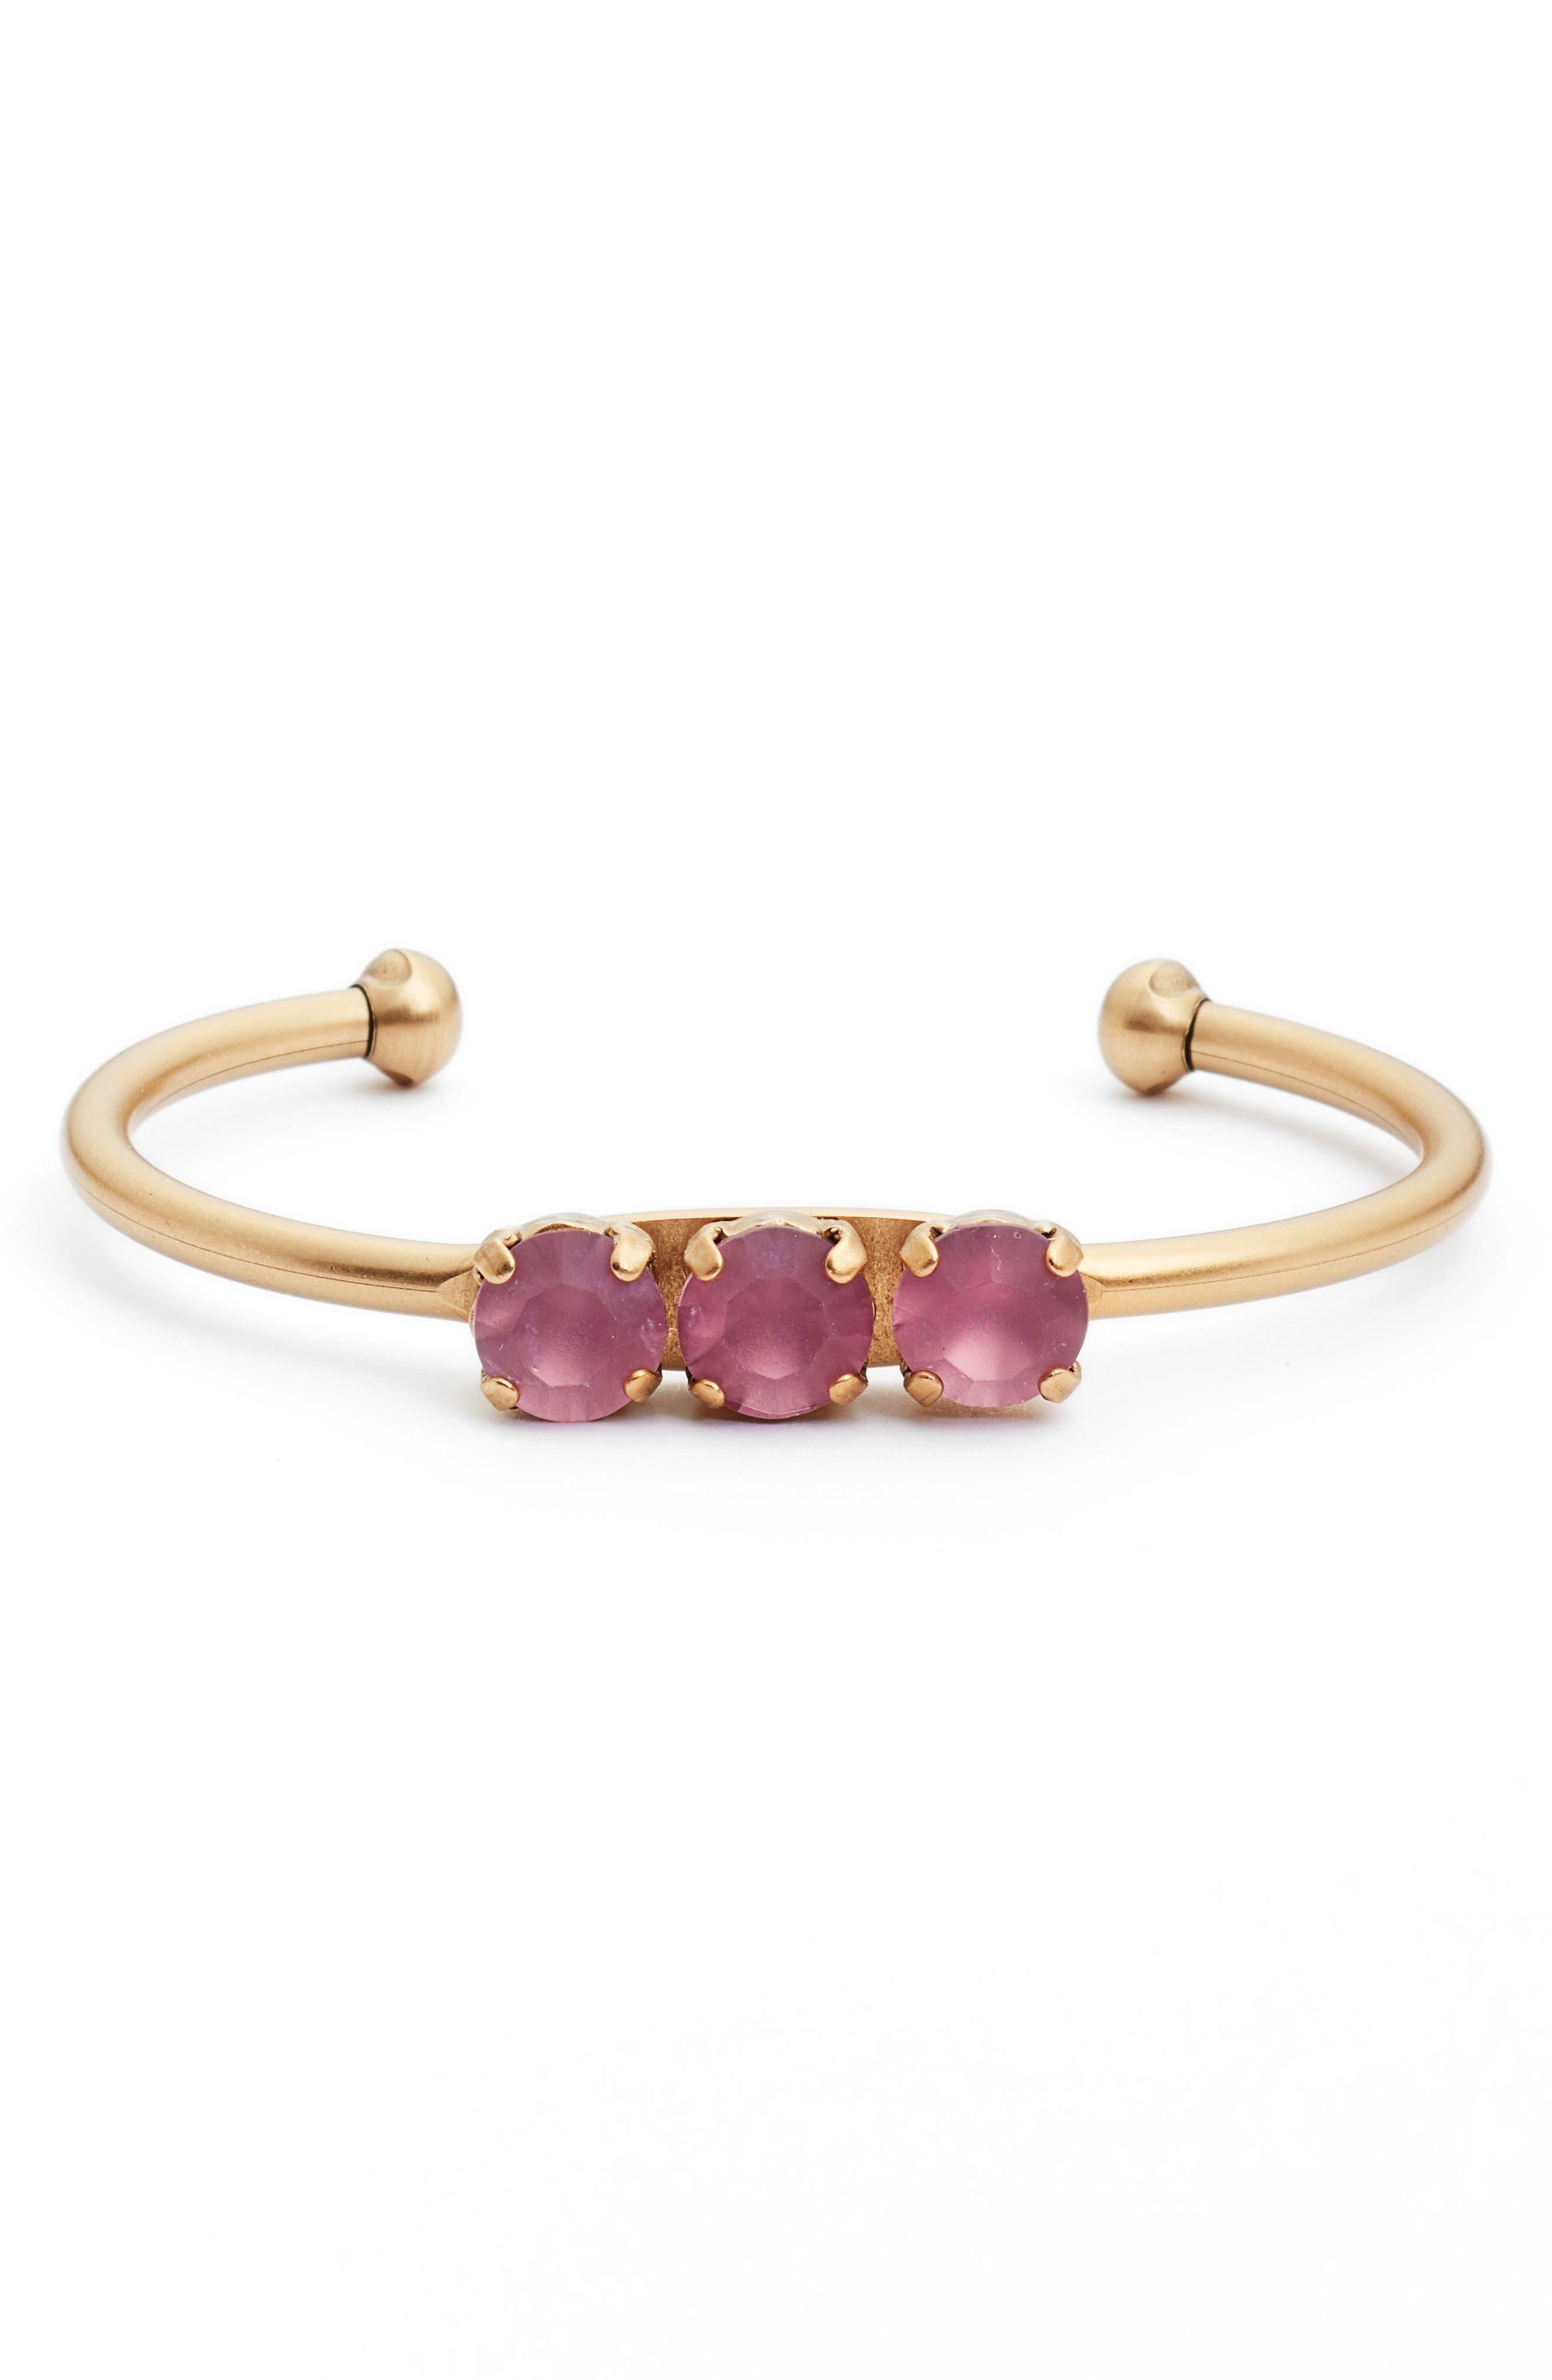 Rosalie Crystal Cuff Bracelet,                             Main thumbnail 1, color,                             ORCHID